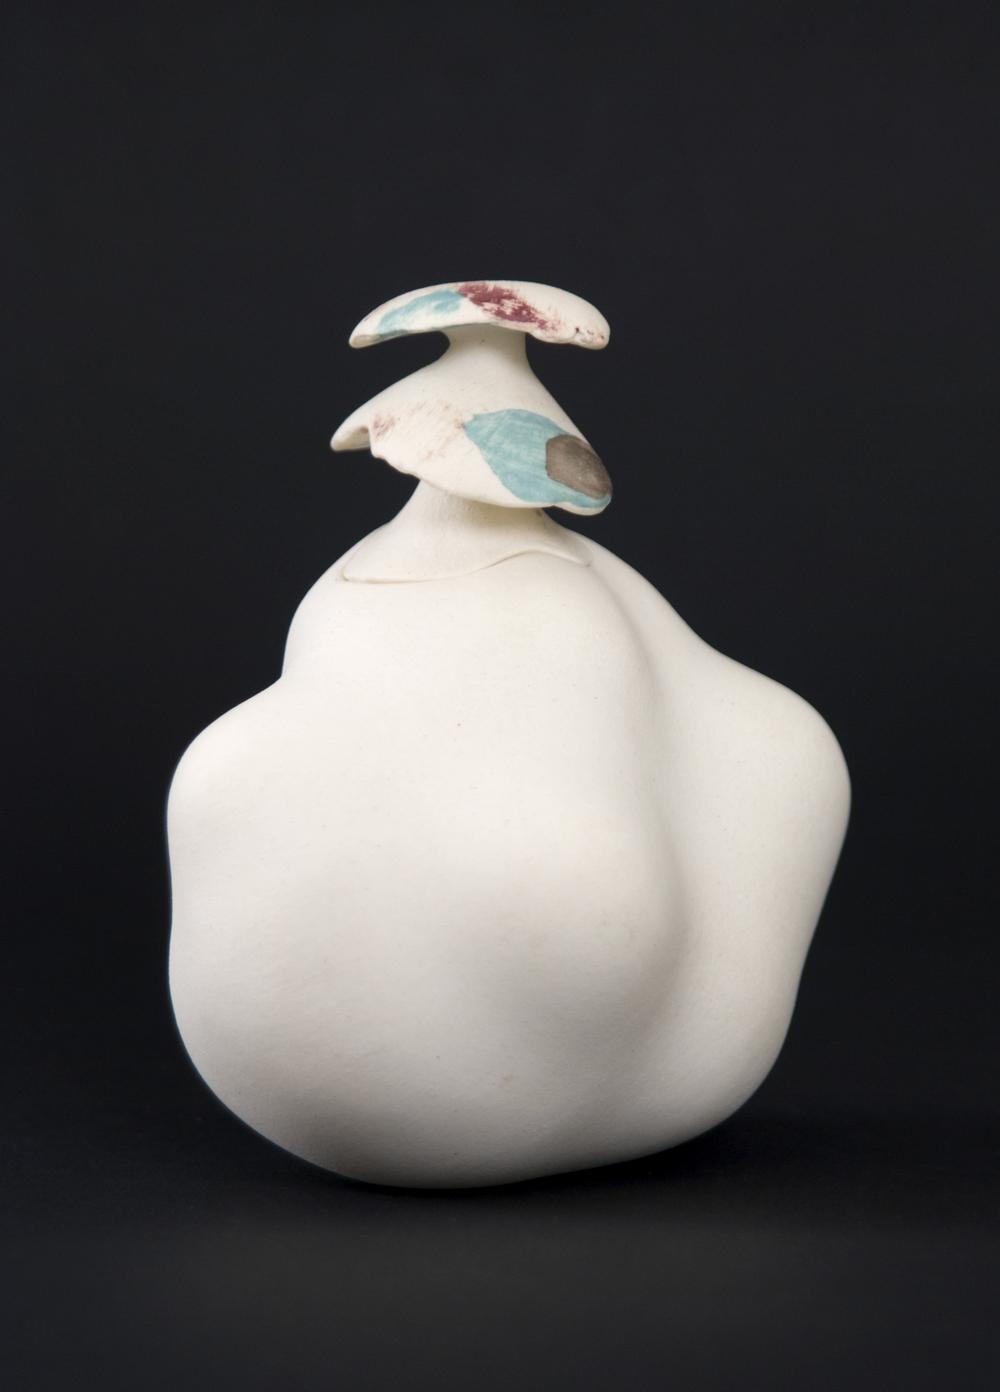 Kyoko Hori    Futamono  , 2004 Porcelain 3 x 2.25 x 2.5 inches / 7.6 x 5.7 x 6.4 cm / KYH 4